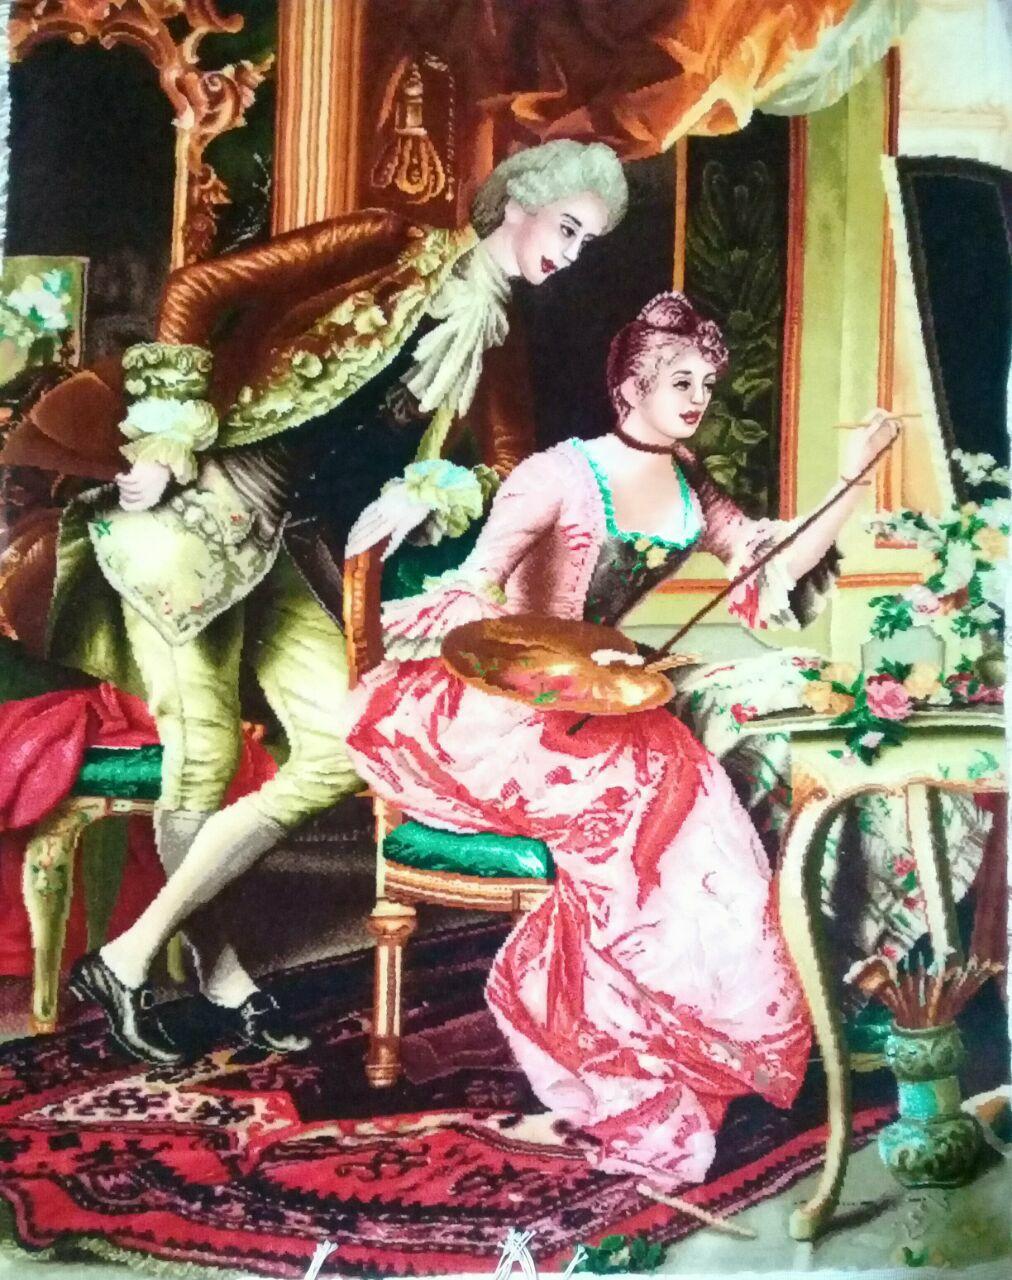 خرید تابلو نقاش جوان